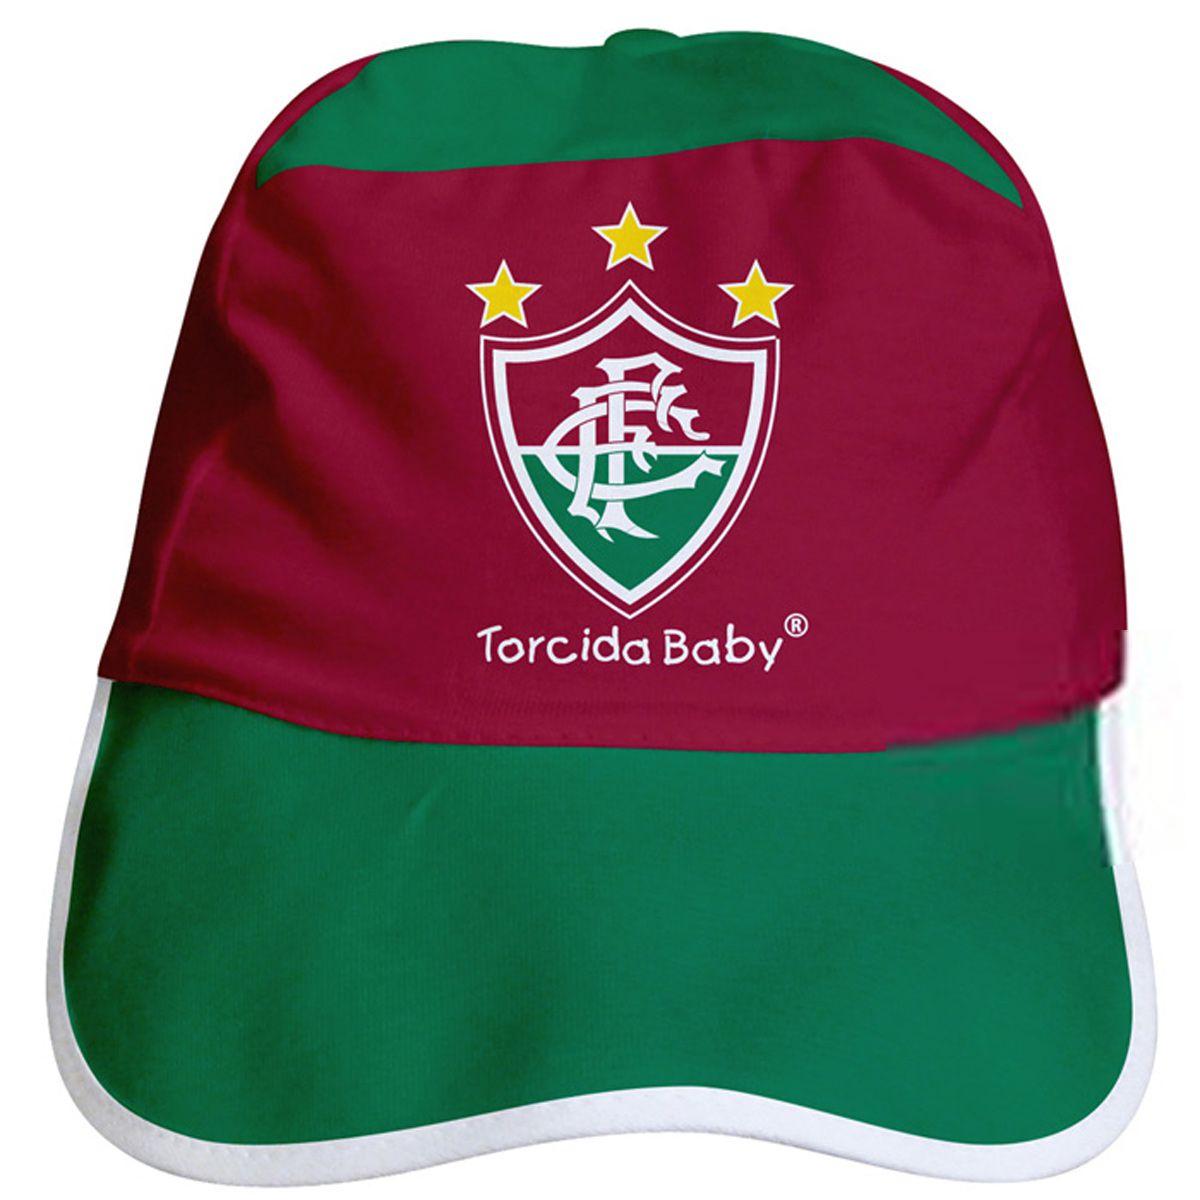 Kit Uniforme Bebê do Fluminense Torcida Baby - 015s